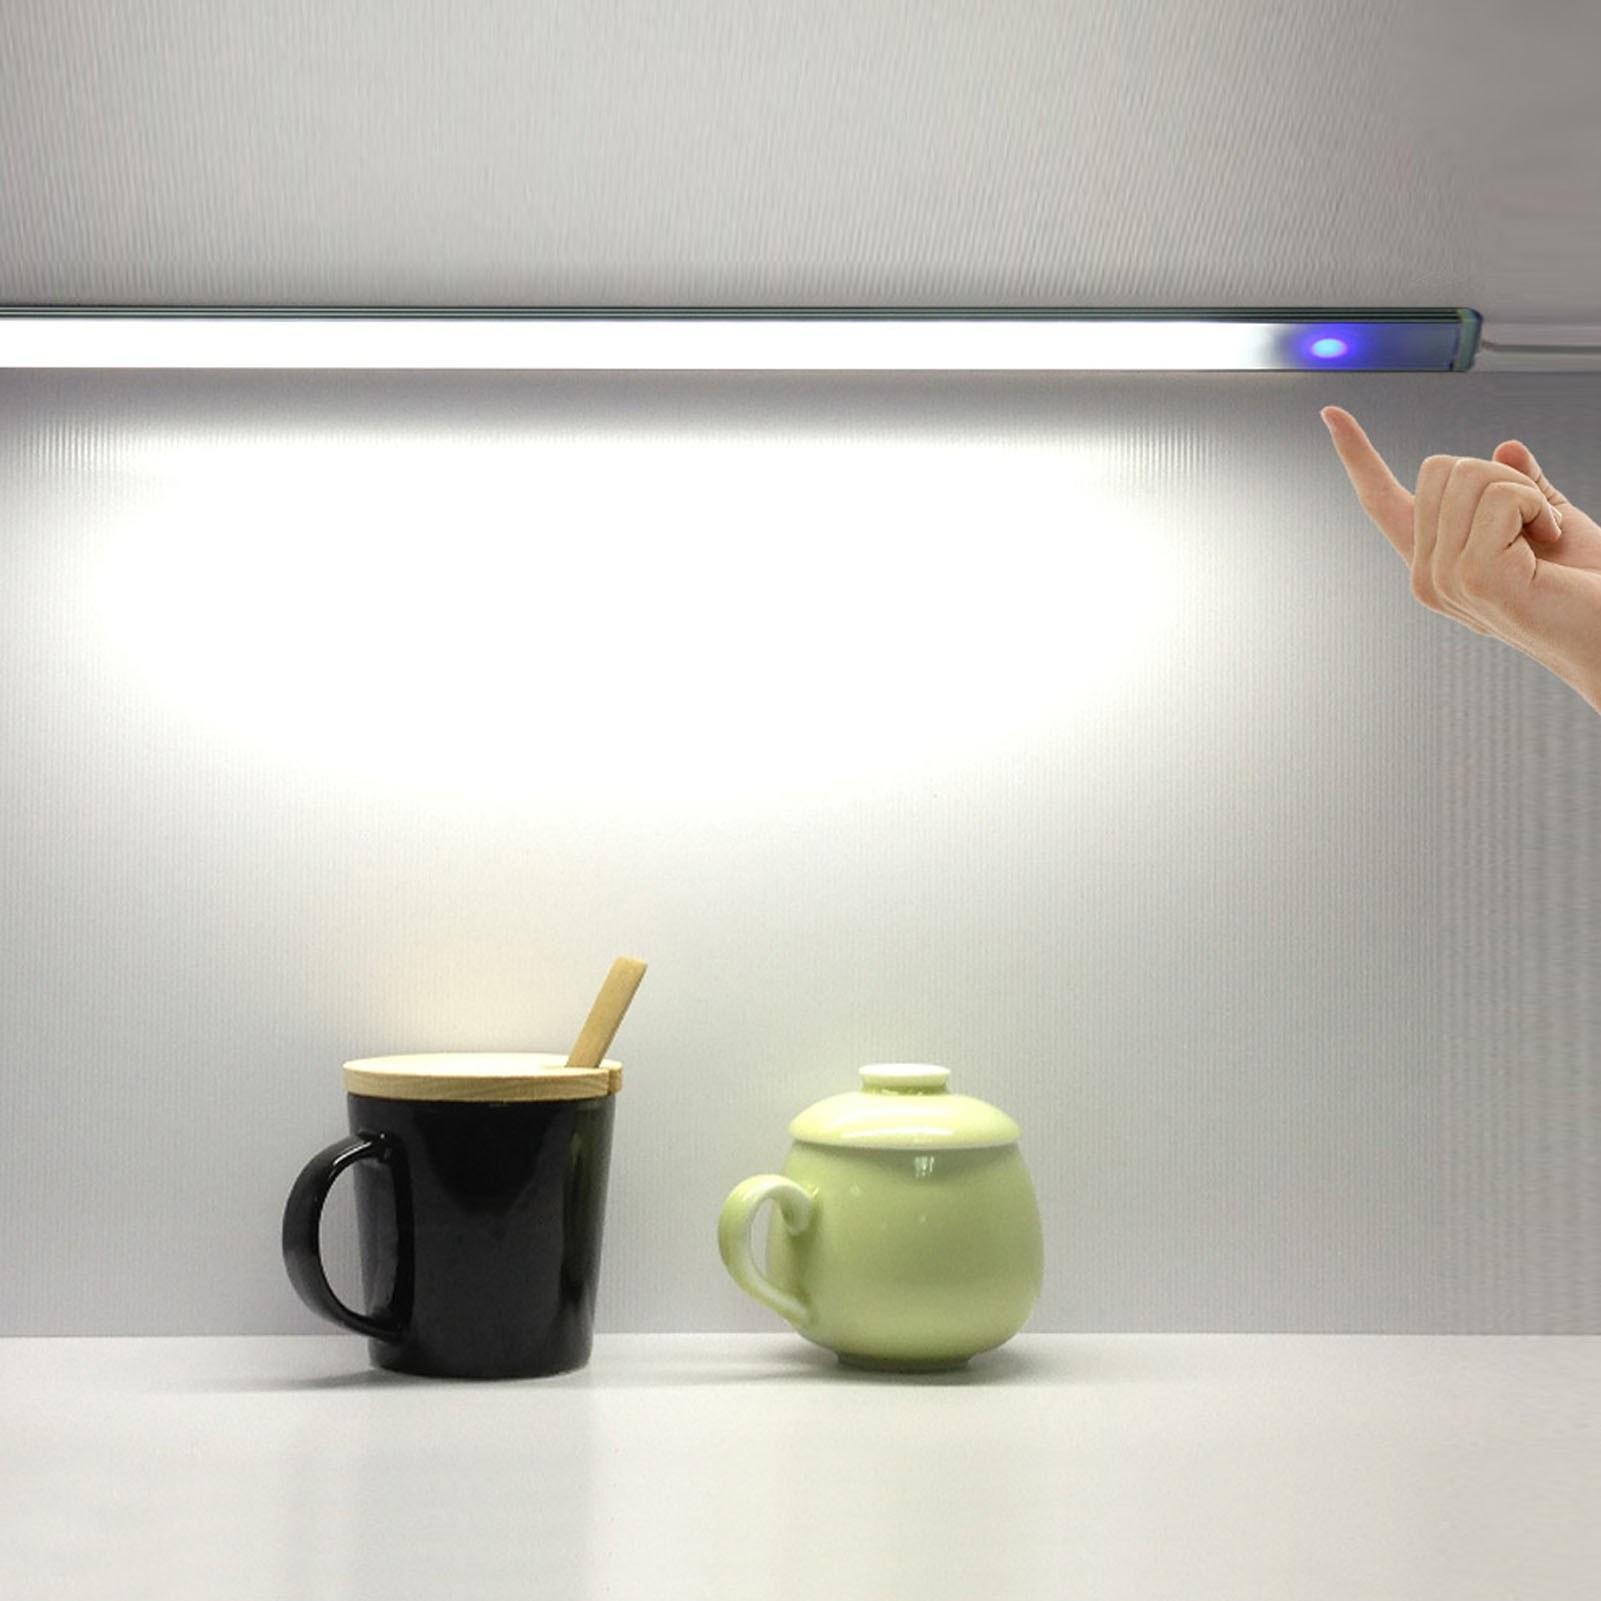 cafago.com - 55% OFF 21 LEDs Cabinet Lamp Night Light Slim Deisgn Seneitive Touching Control,free shipping+$11.17